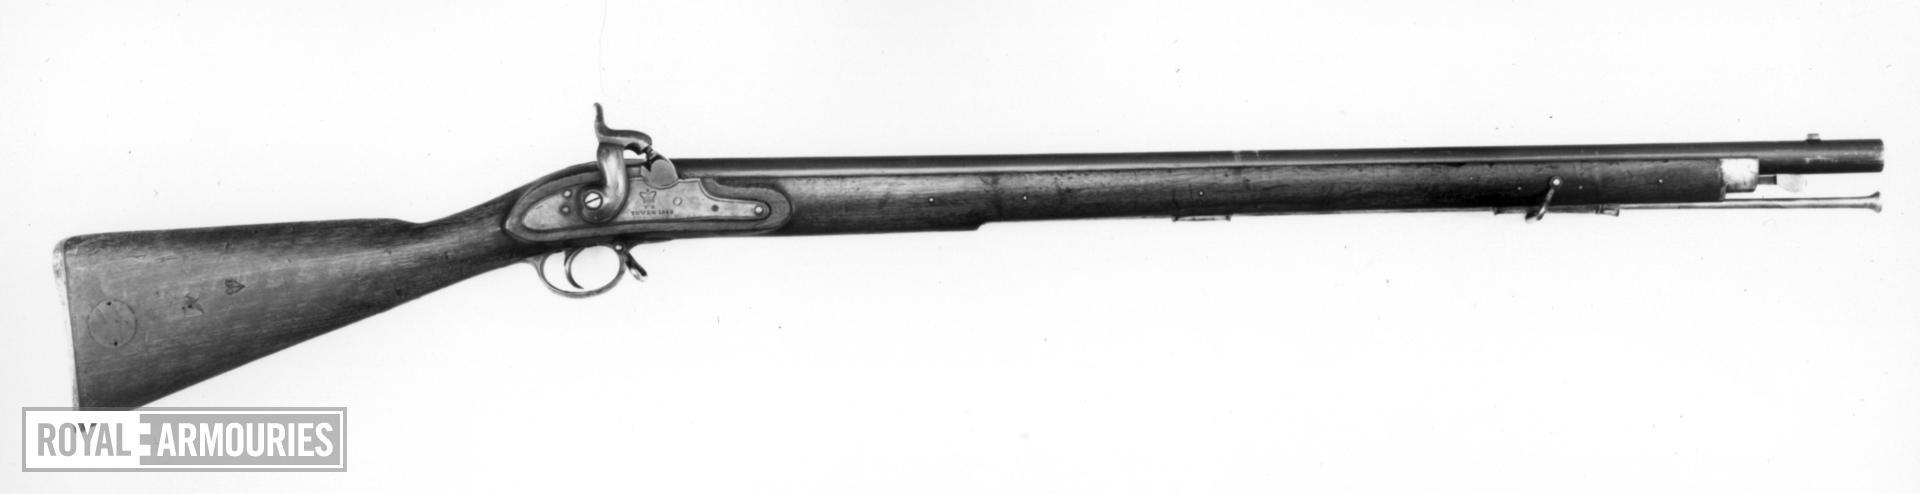 Percussion muzzle-loading military musket - Pattern 1845 Sea Service